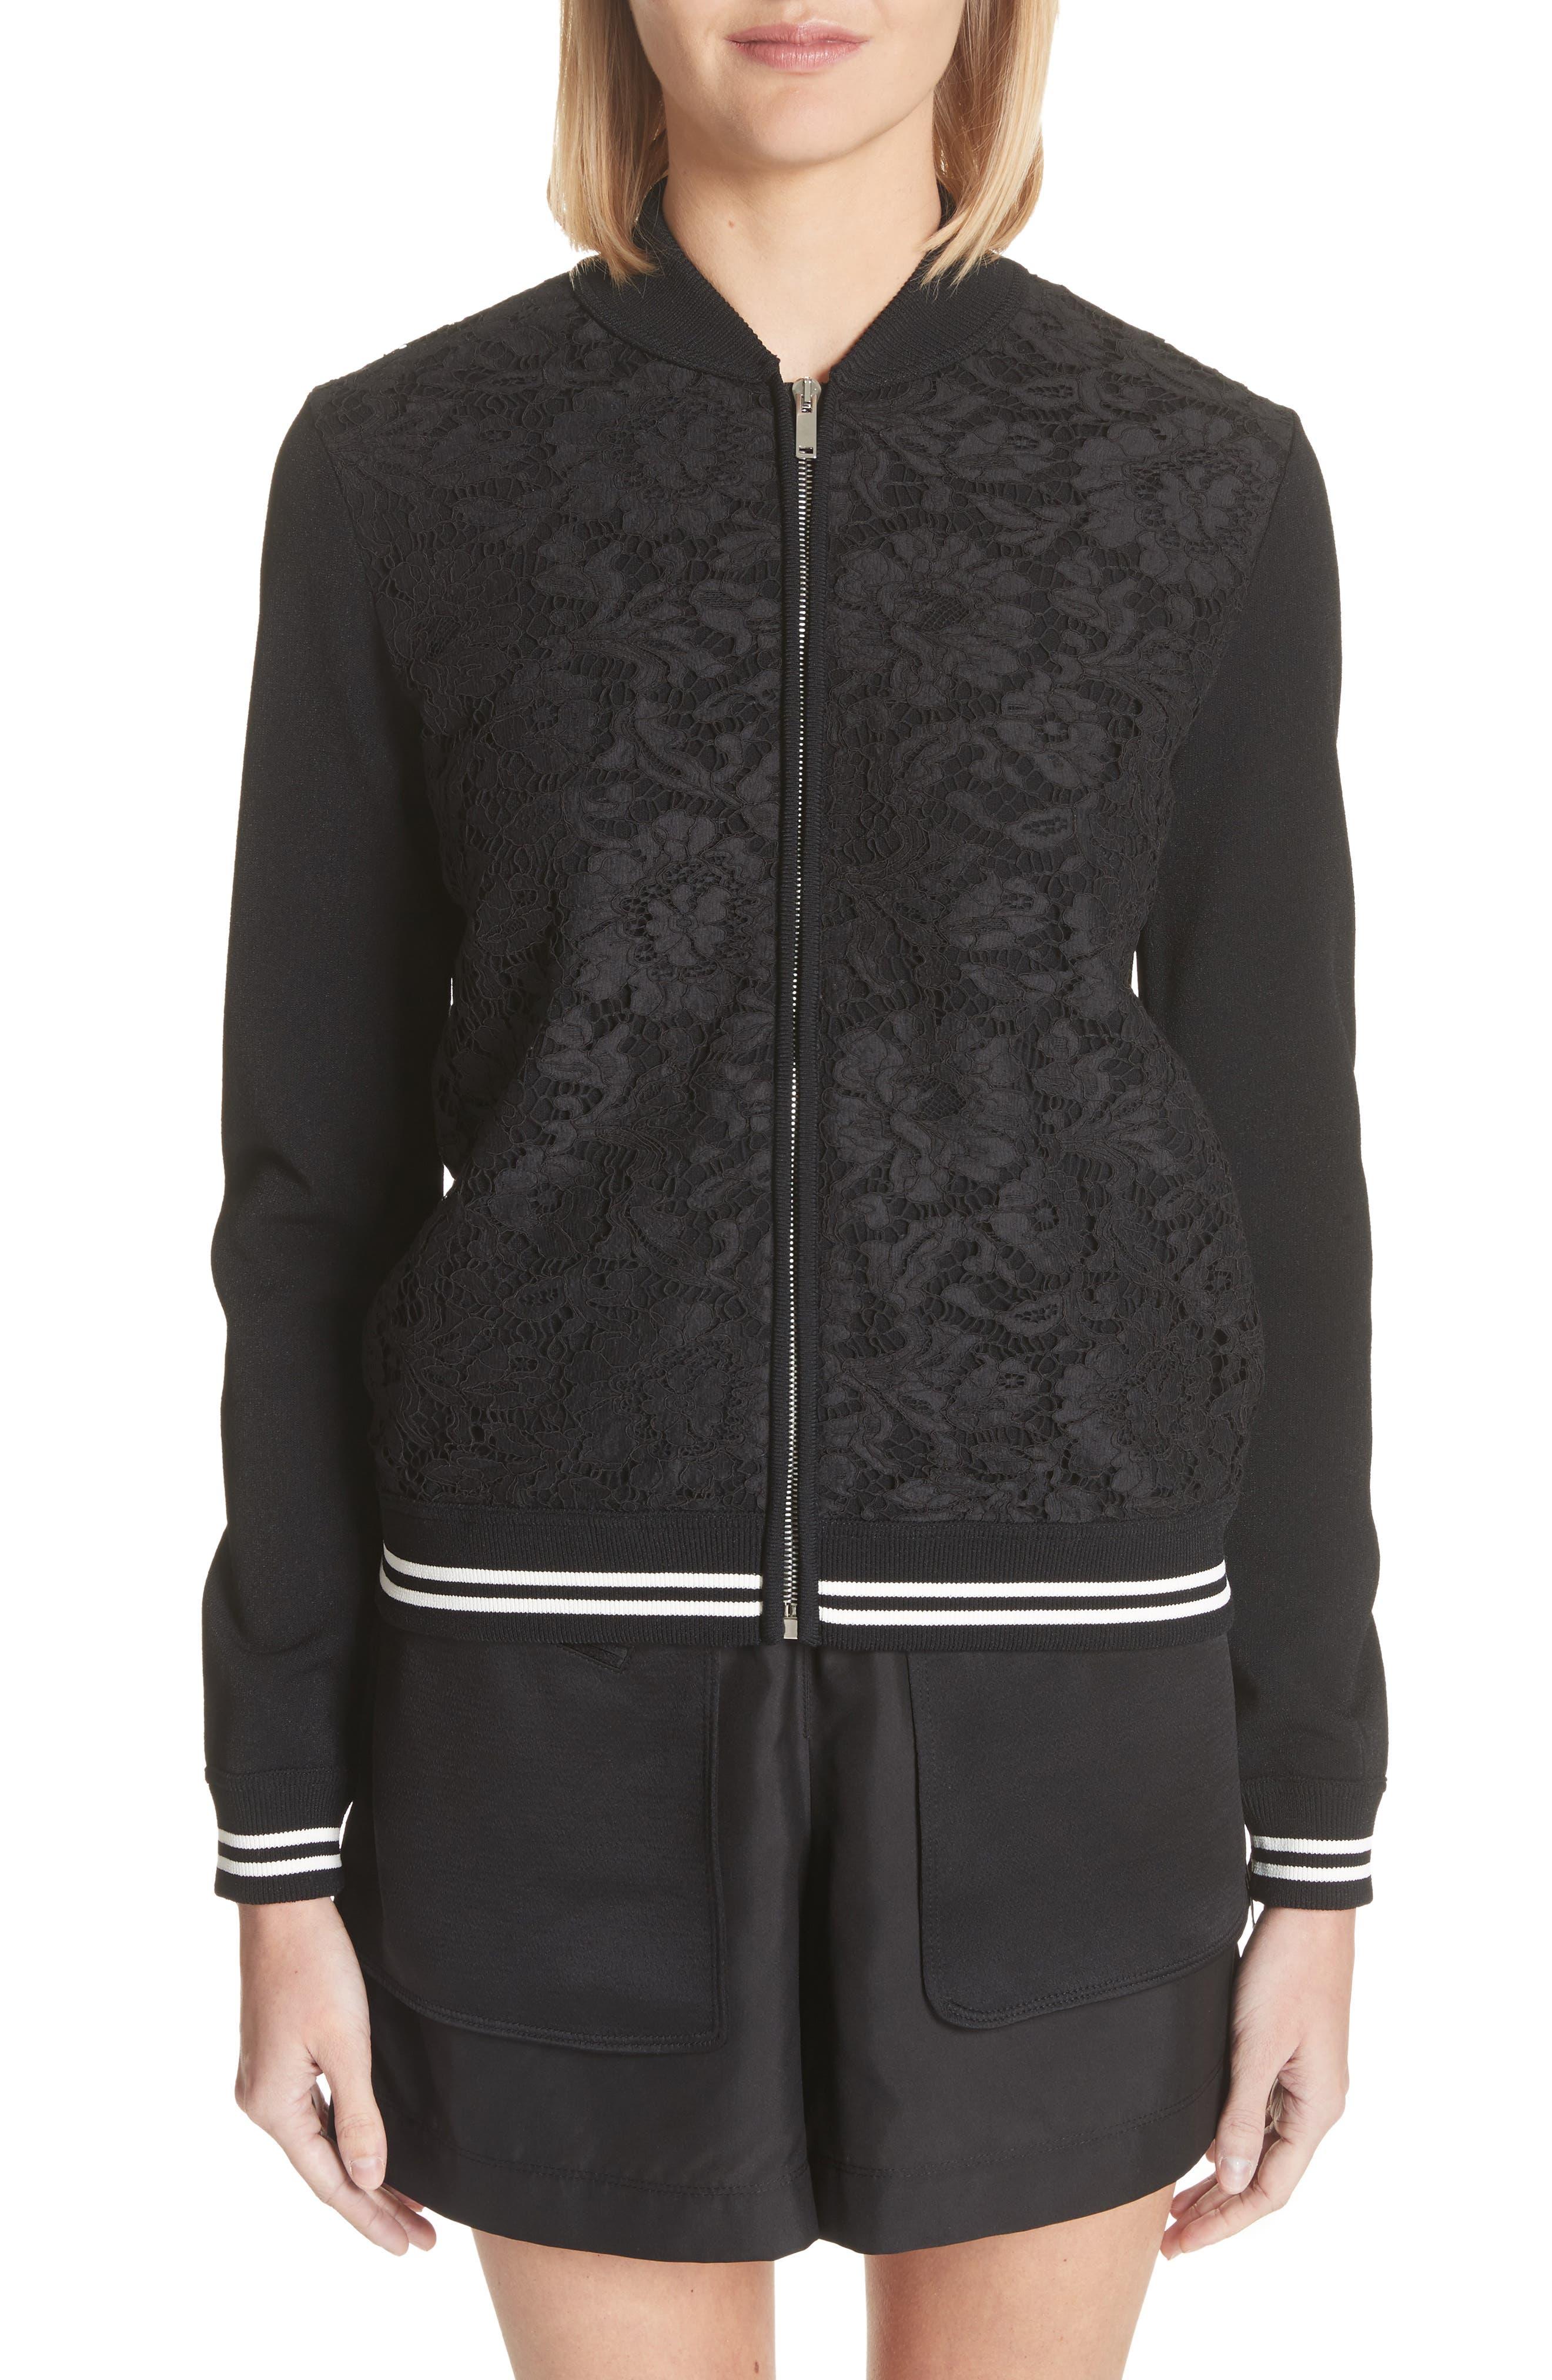 Lace Front Bomber Jacket,                             Main thumbnail 1, color,                             Black